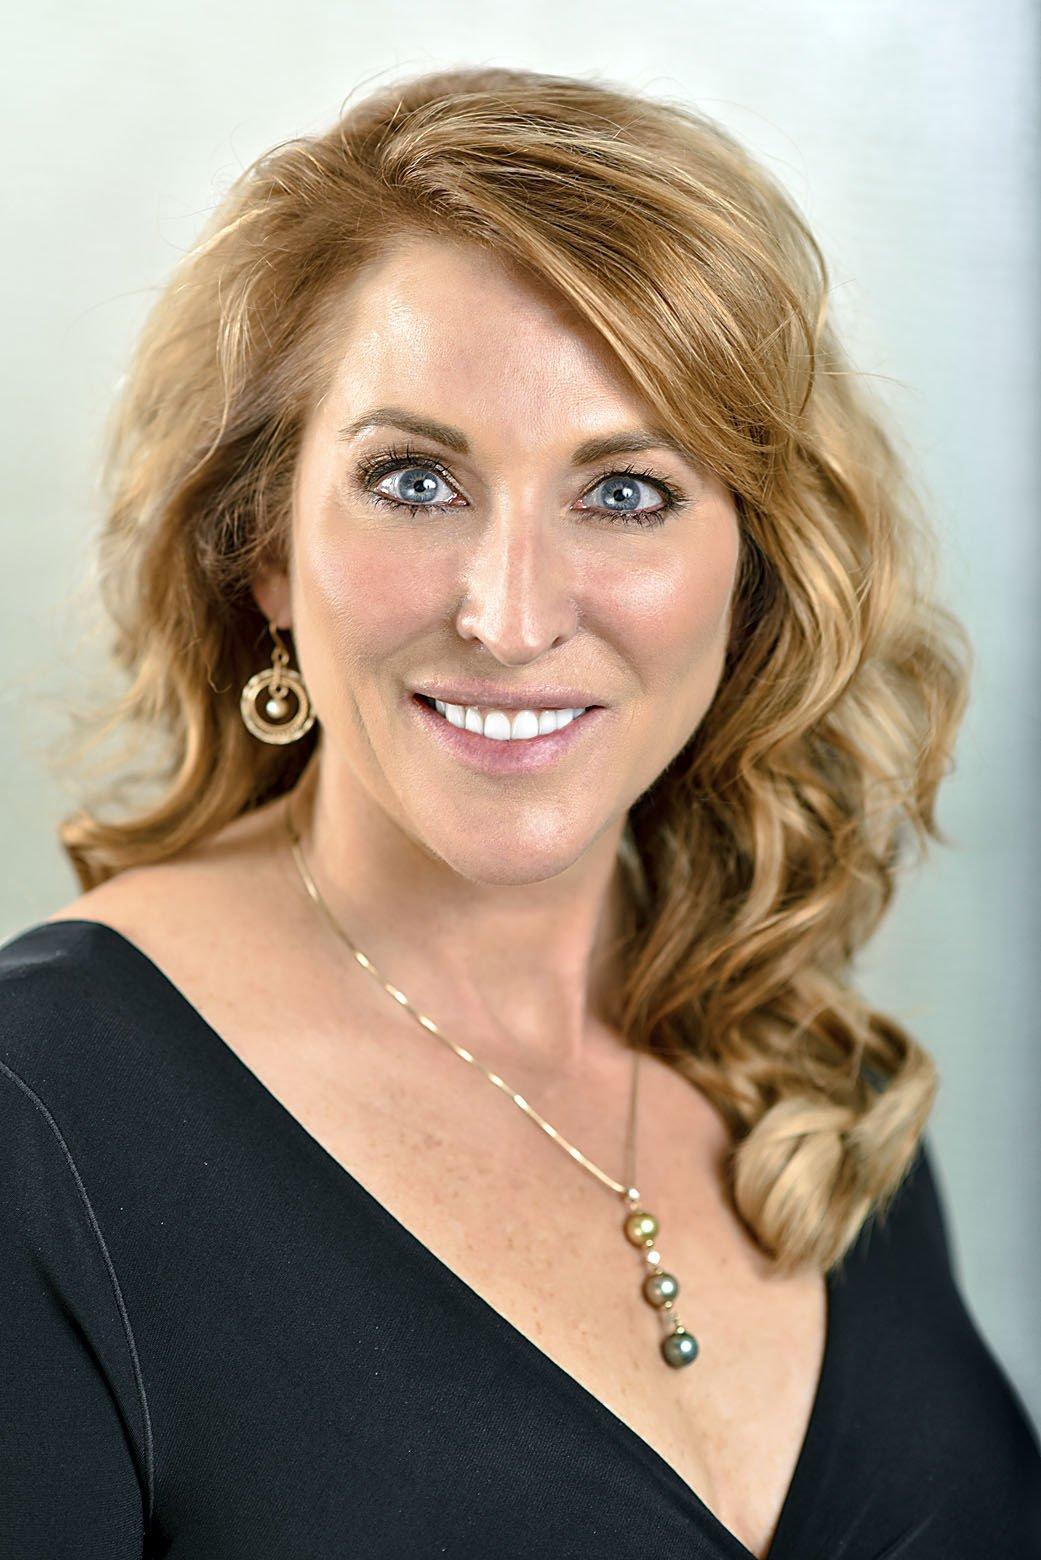 Dr. Catherine Durboraw